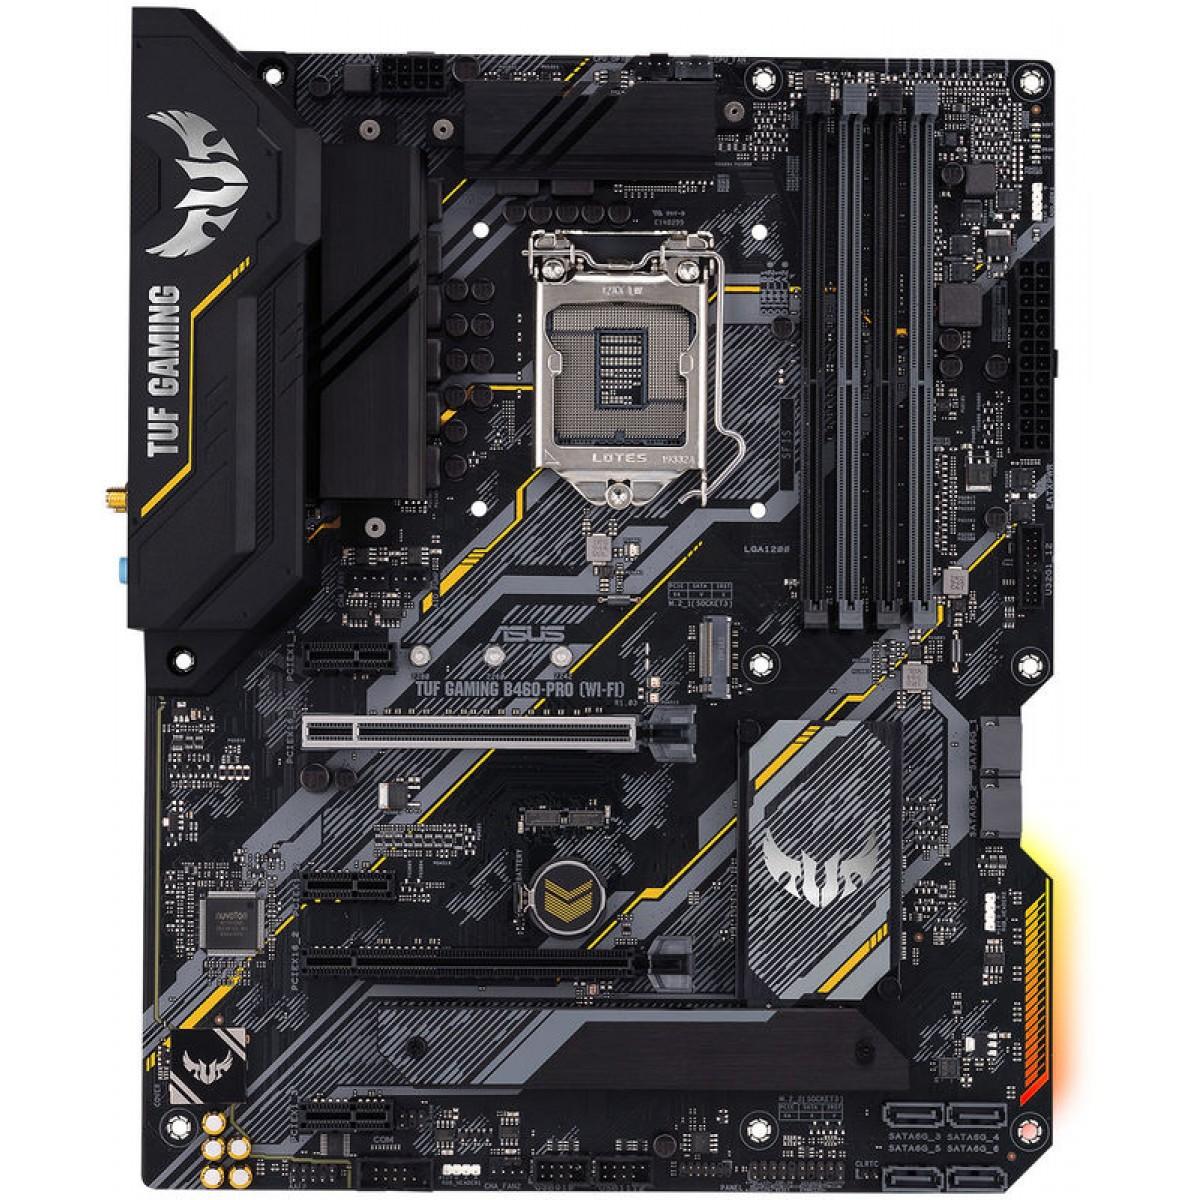 Placa Mãe Asus Tuf Gaming B460-Pro Wi-Fi, Chipset B460, Intel LGA 1200, ATX, DDR4